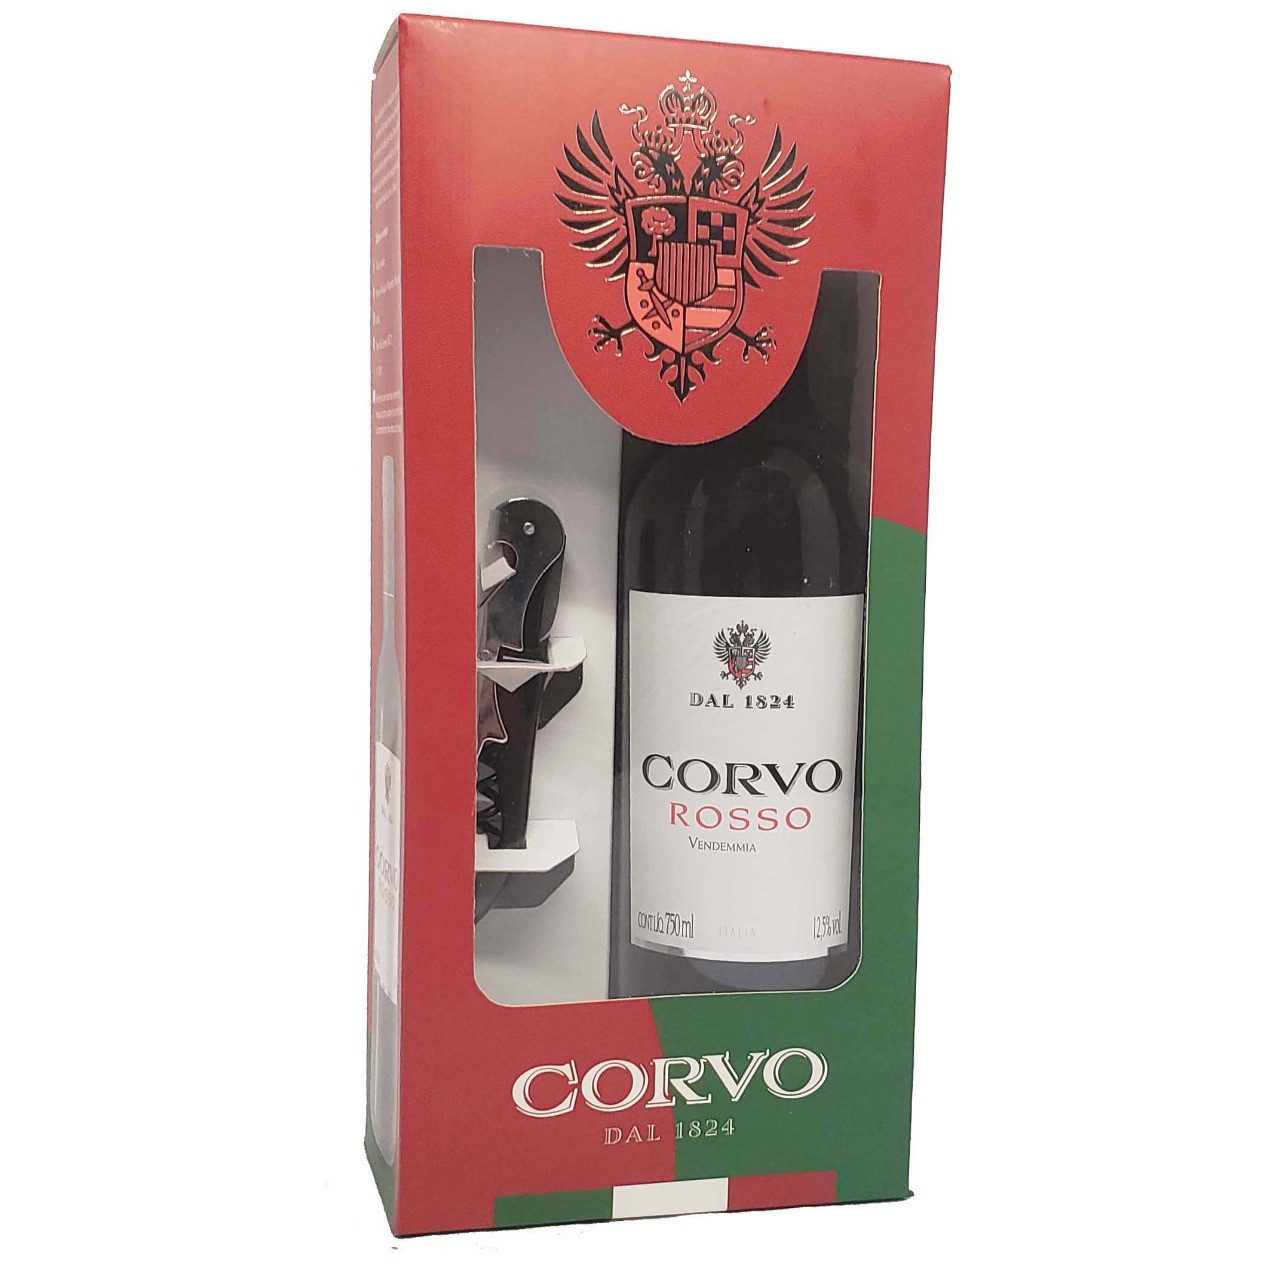 Kit Vinho Tinto Corvo Vendemmia + Abridor de Garrafa - 750ml -